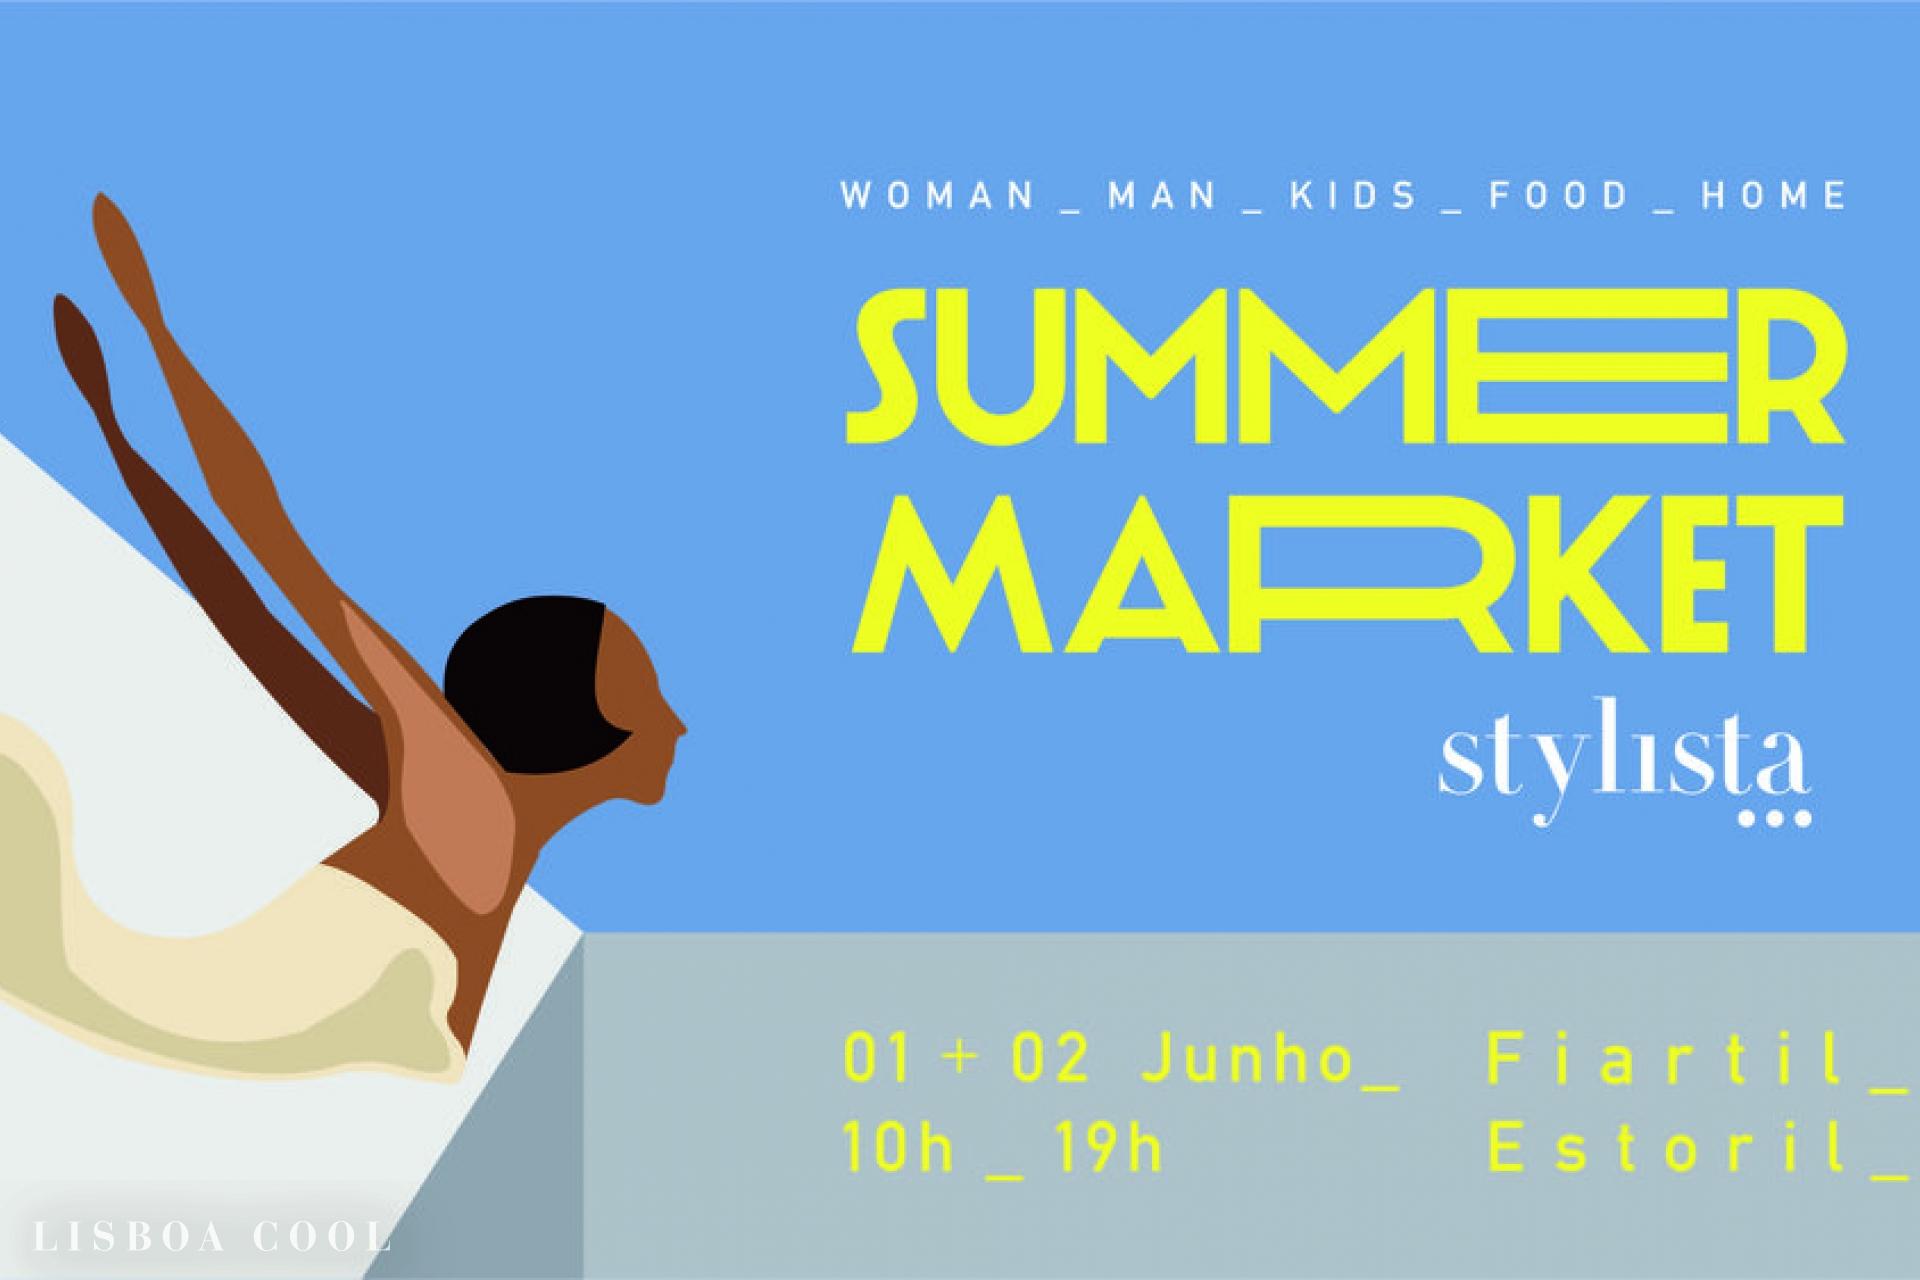 LisboaCool_Blog_Aqui Perto: Summer Market Stylista